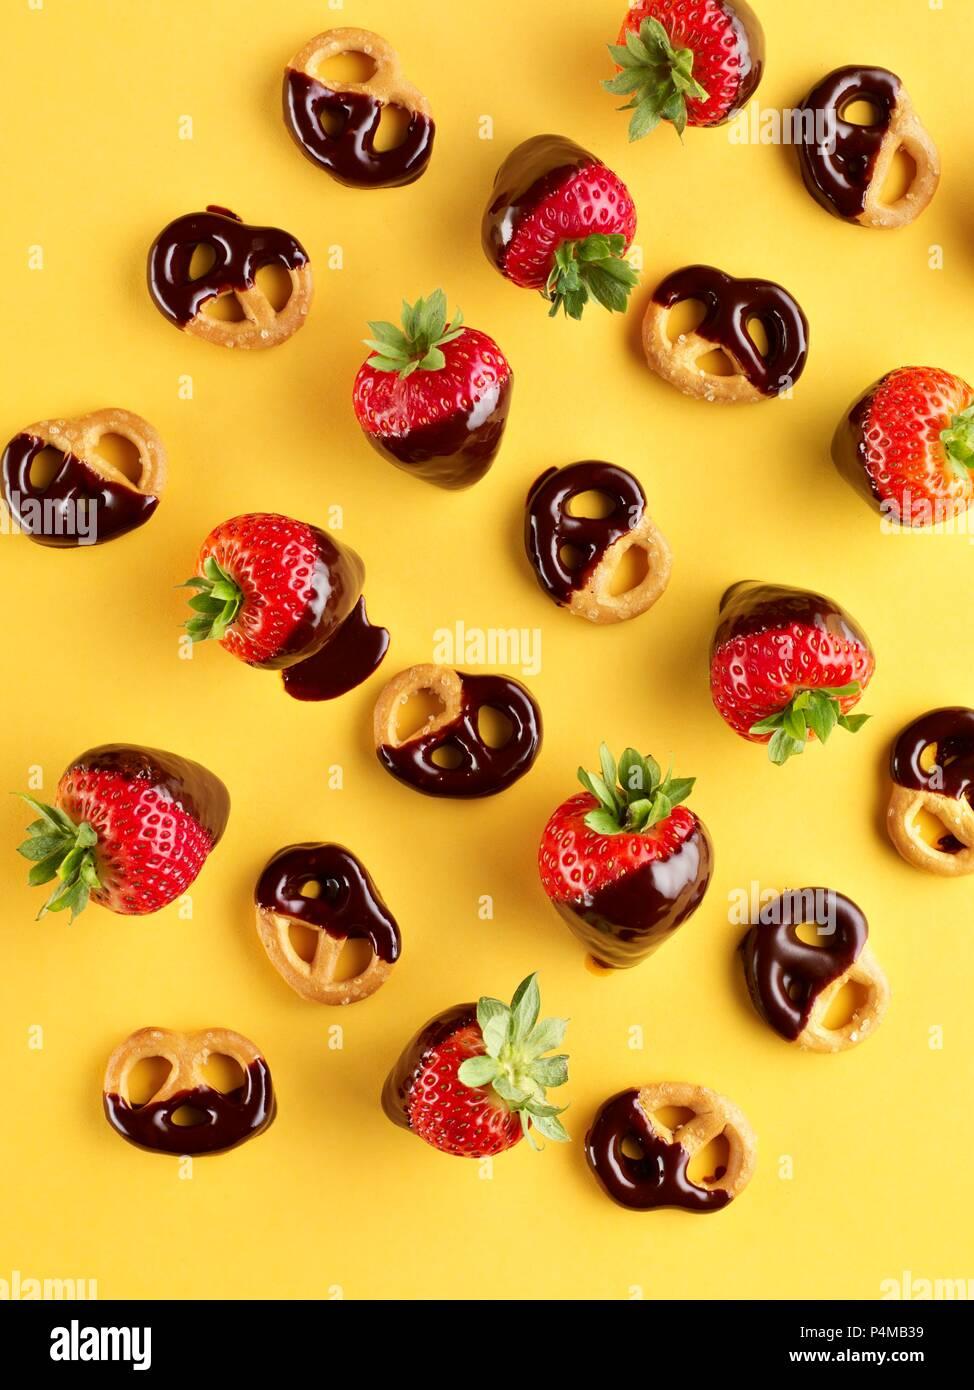 Chocolate strawberries and chocolate pretzels - Stock Image